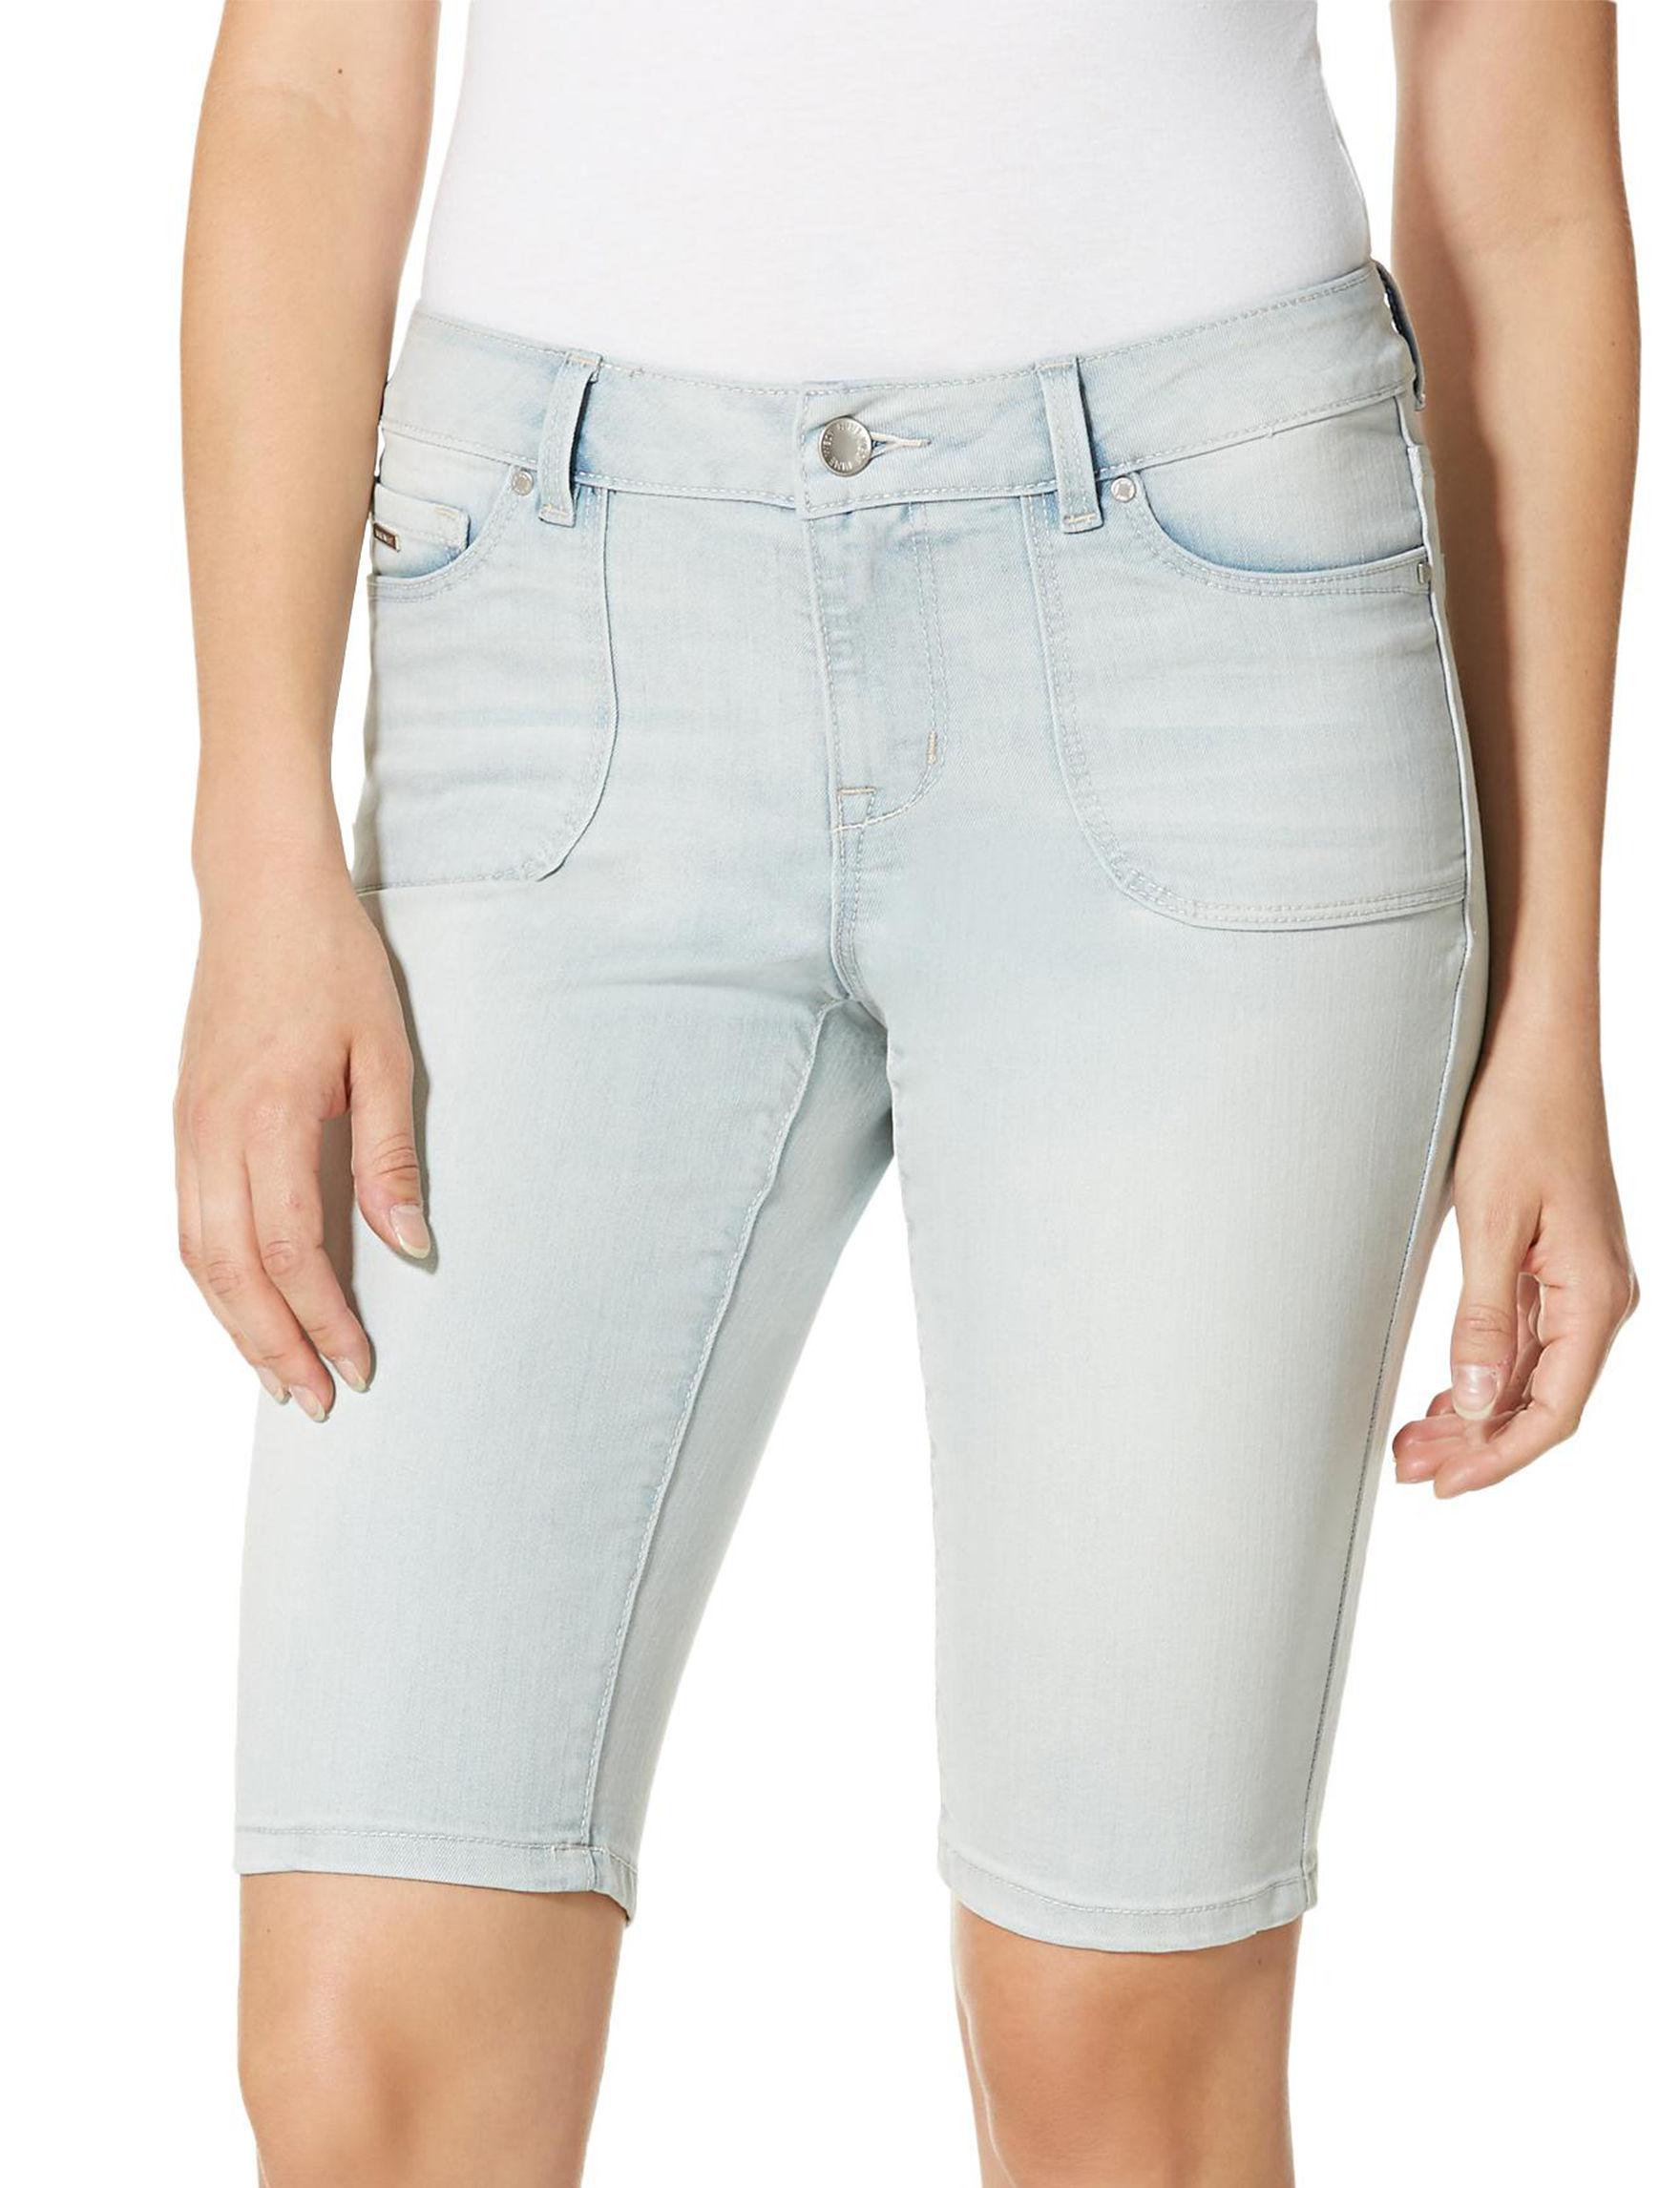 Nine West Jeans Light Blue Denim Shorts